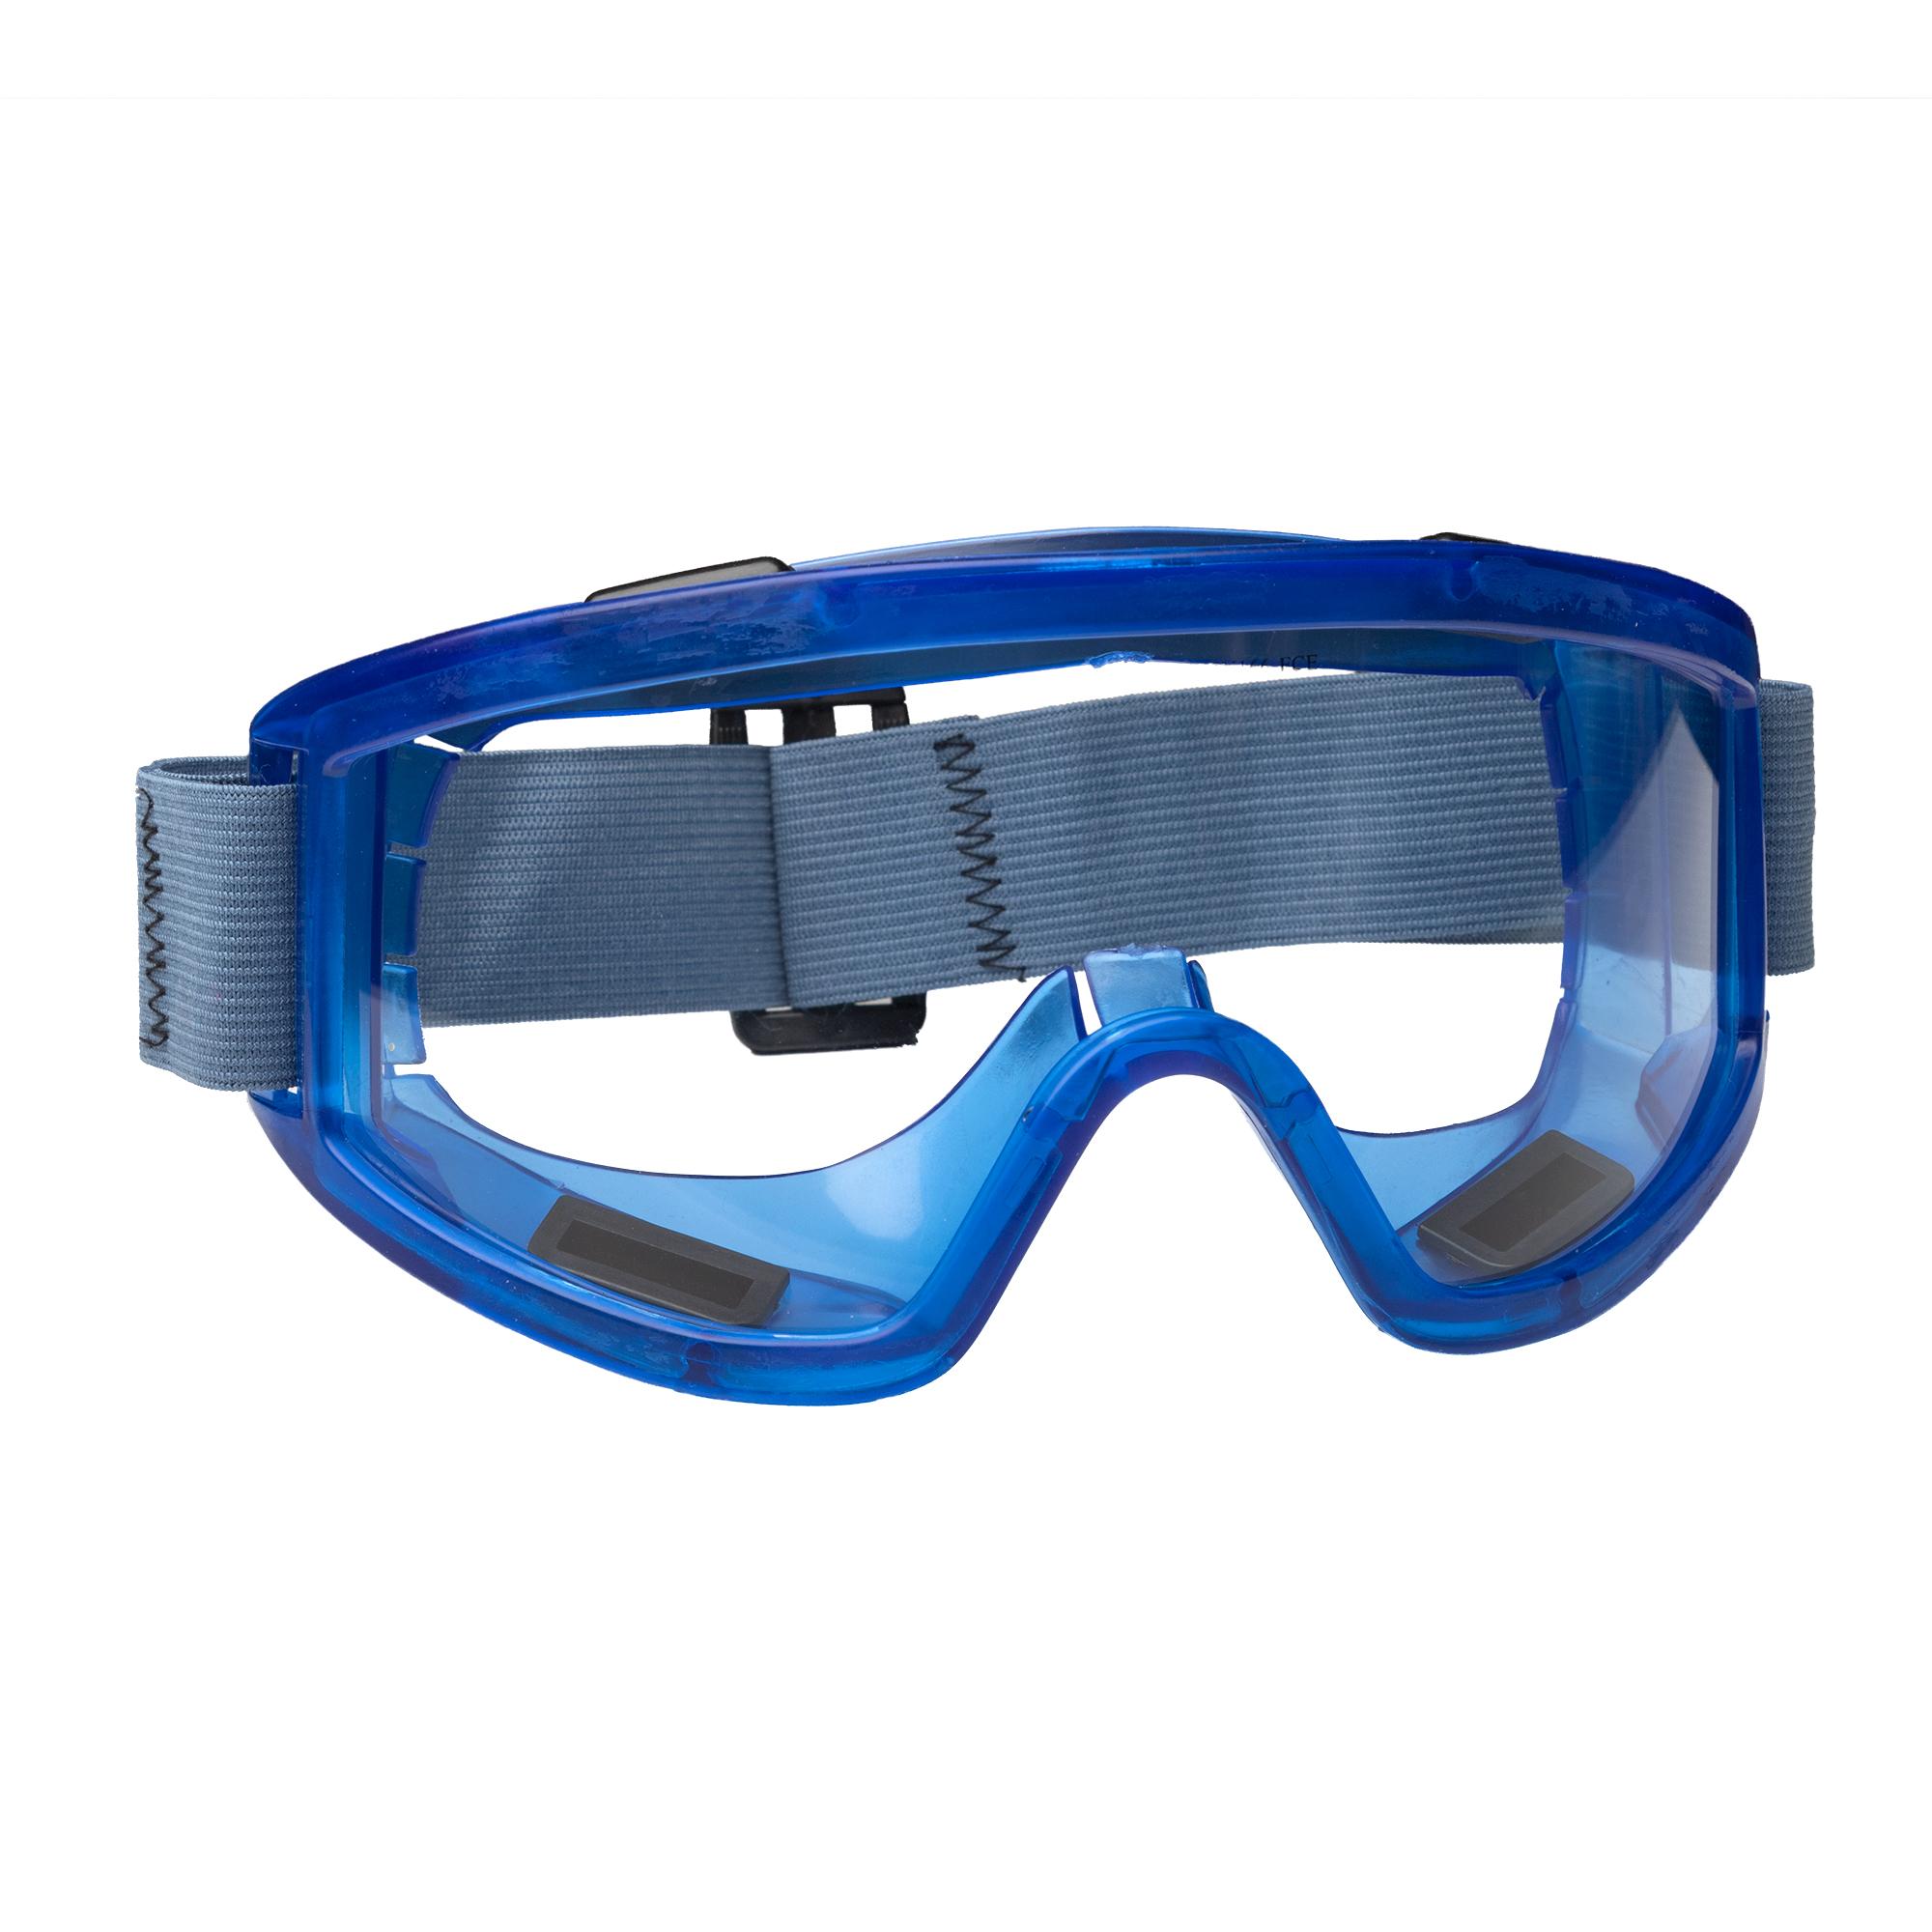 عینک ایمنی مدل پرشین